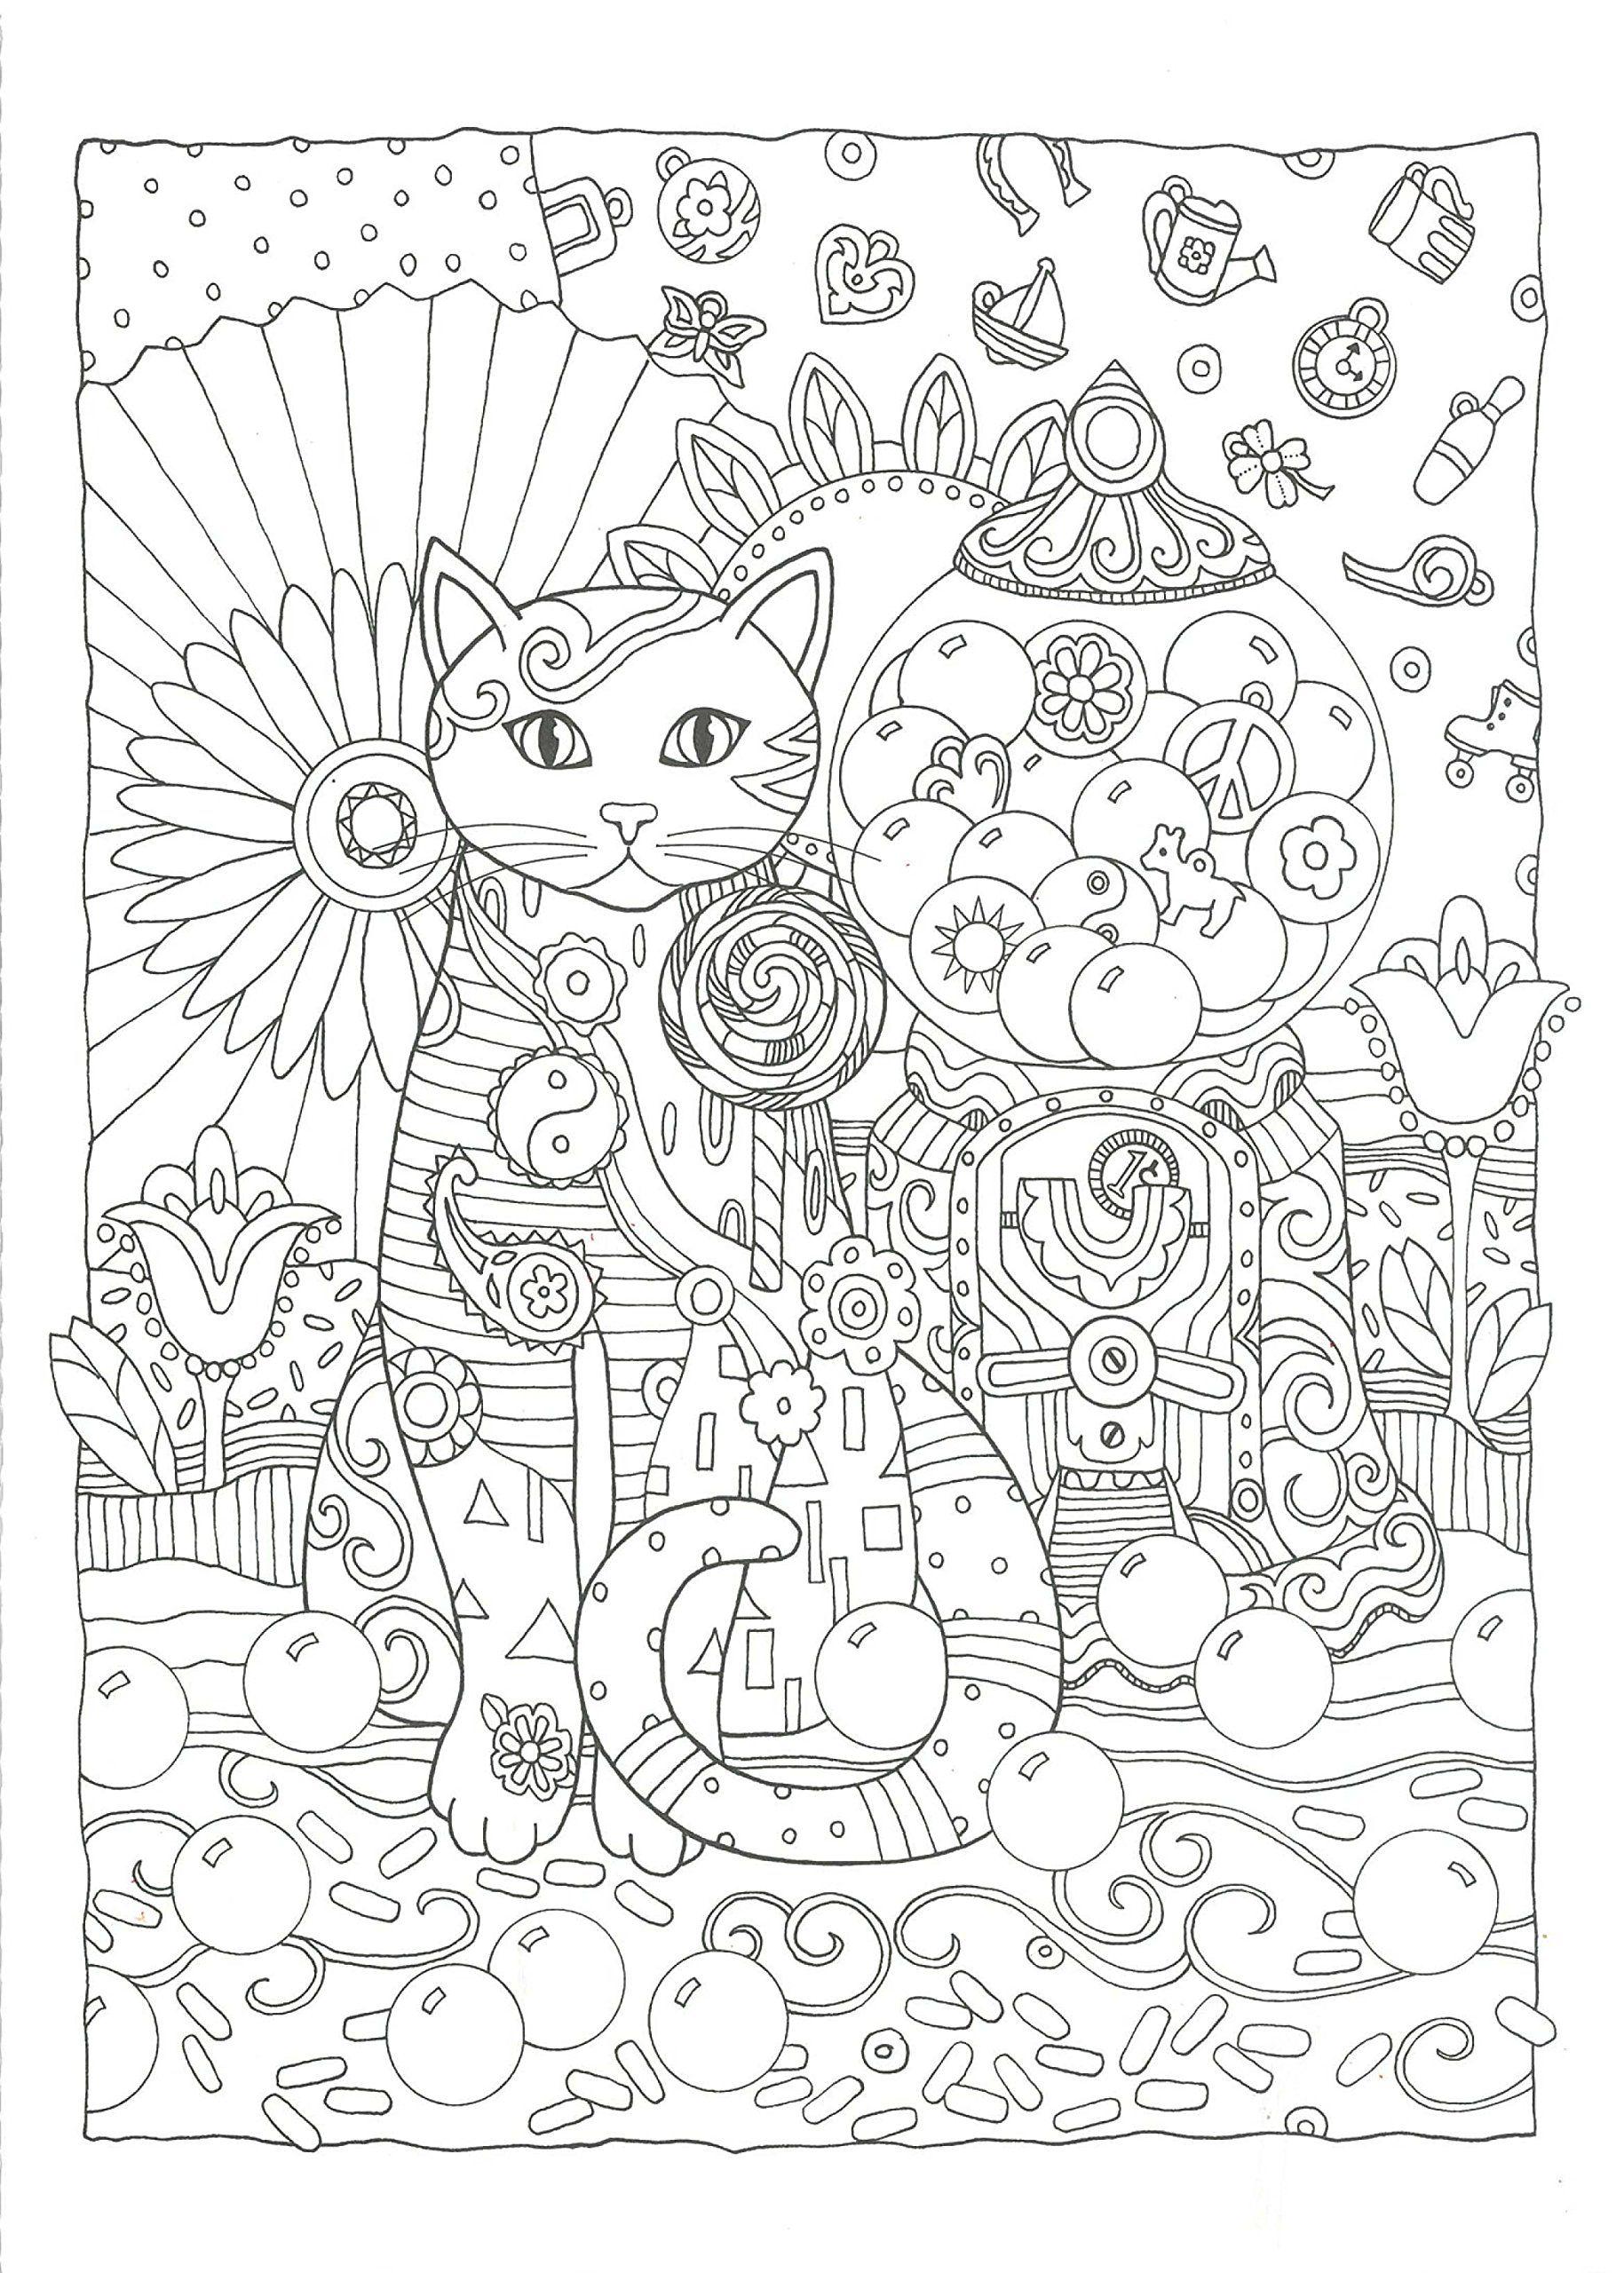 Ausmalbilder Mandala Für Erwachsene Katzen : Pin Von Mama Mia Auf Cute Coloring Book Pinterest